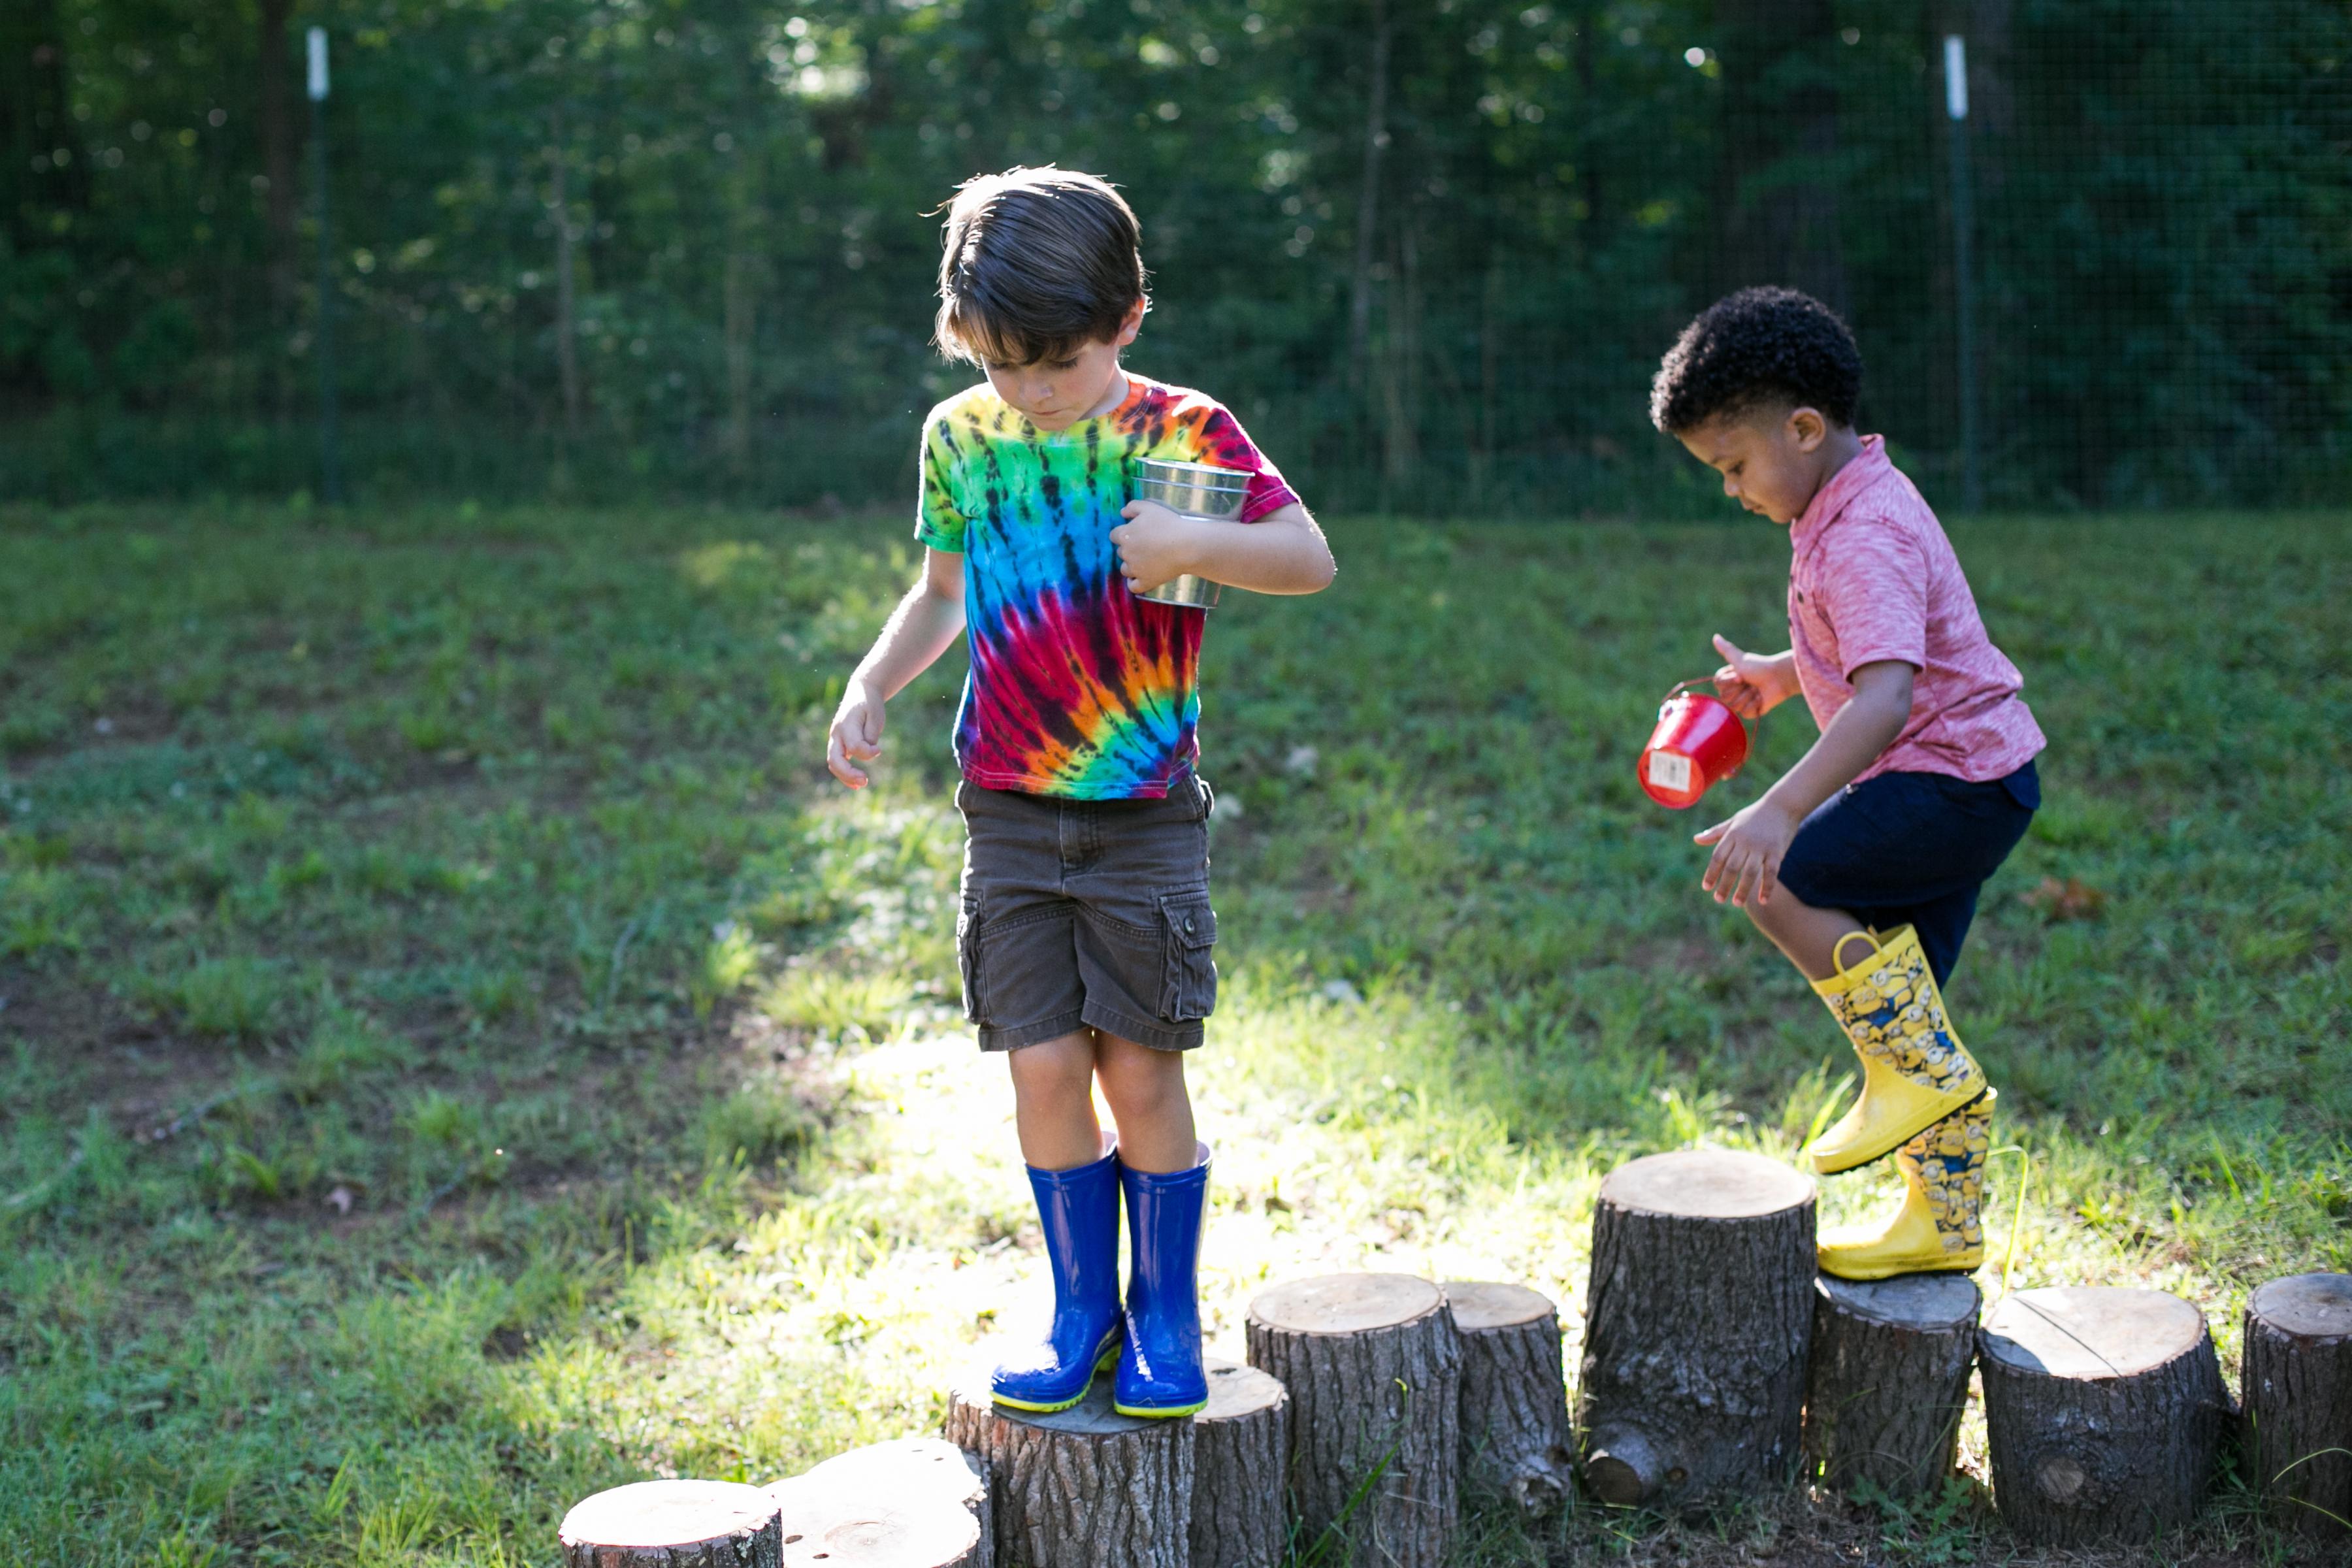 Children balancing